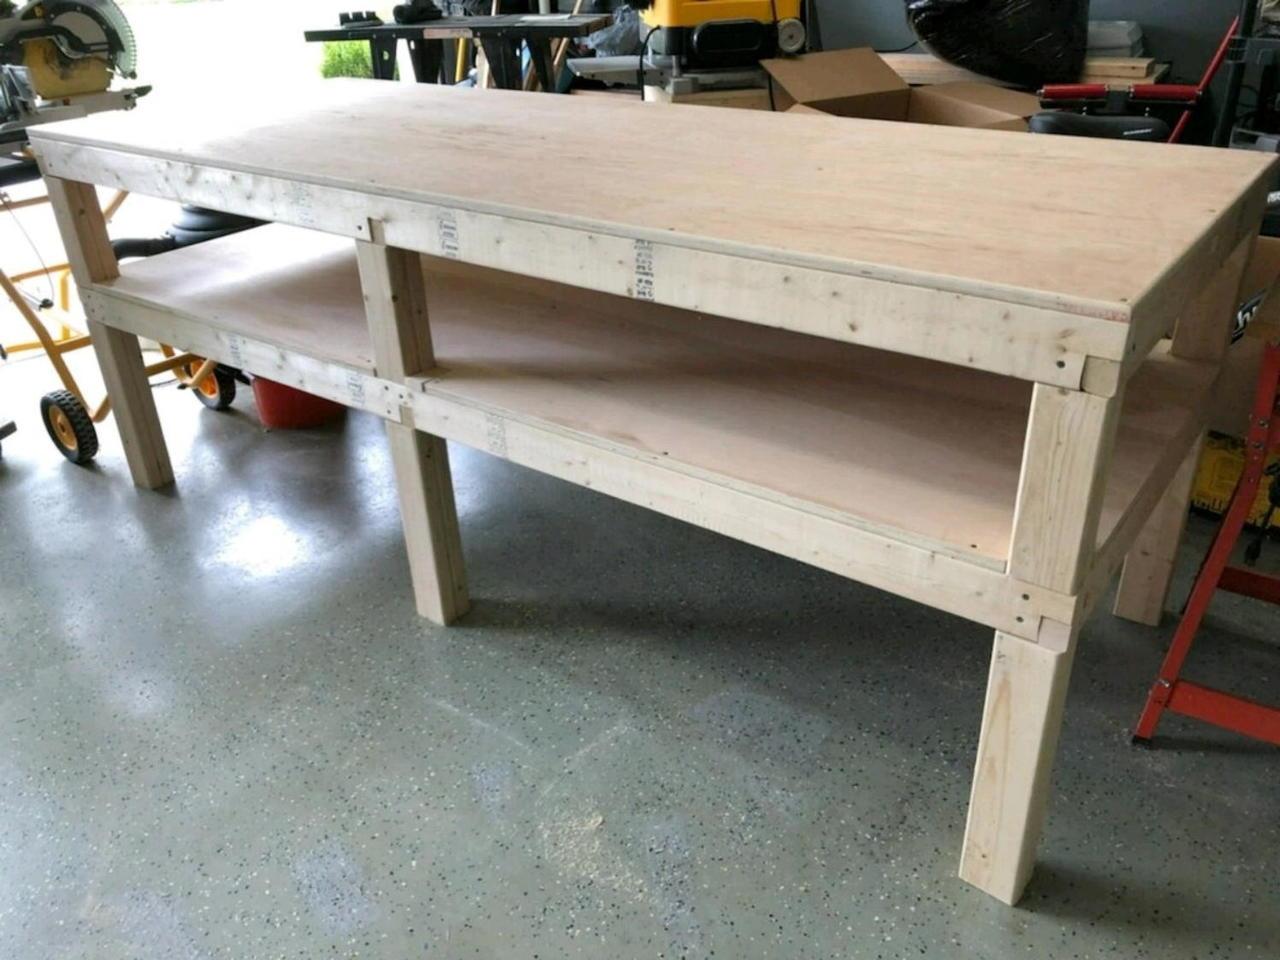 Pleasing 21 Tutorials Of 2X4 Bench How To Make Woodwork Creativecarmelina Interior Chair Design Creativecarmelinacom